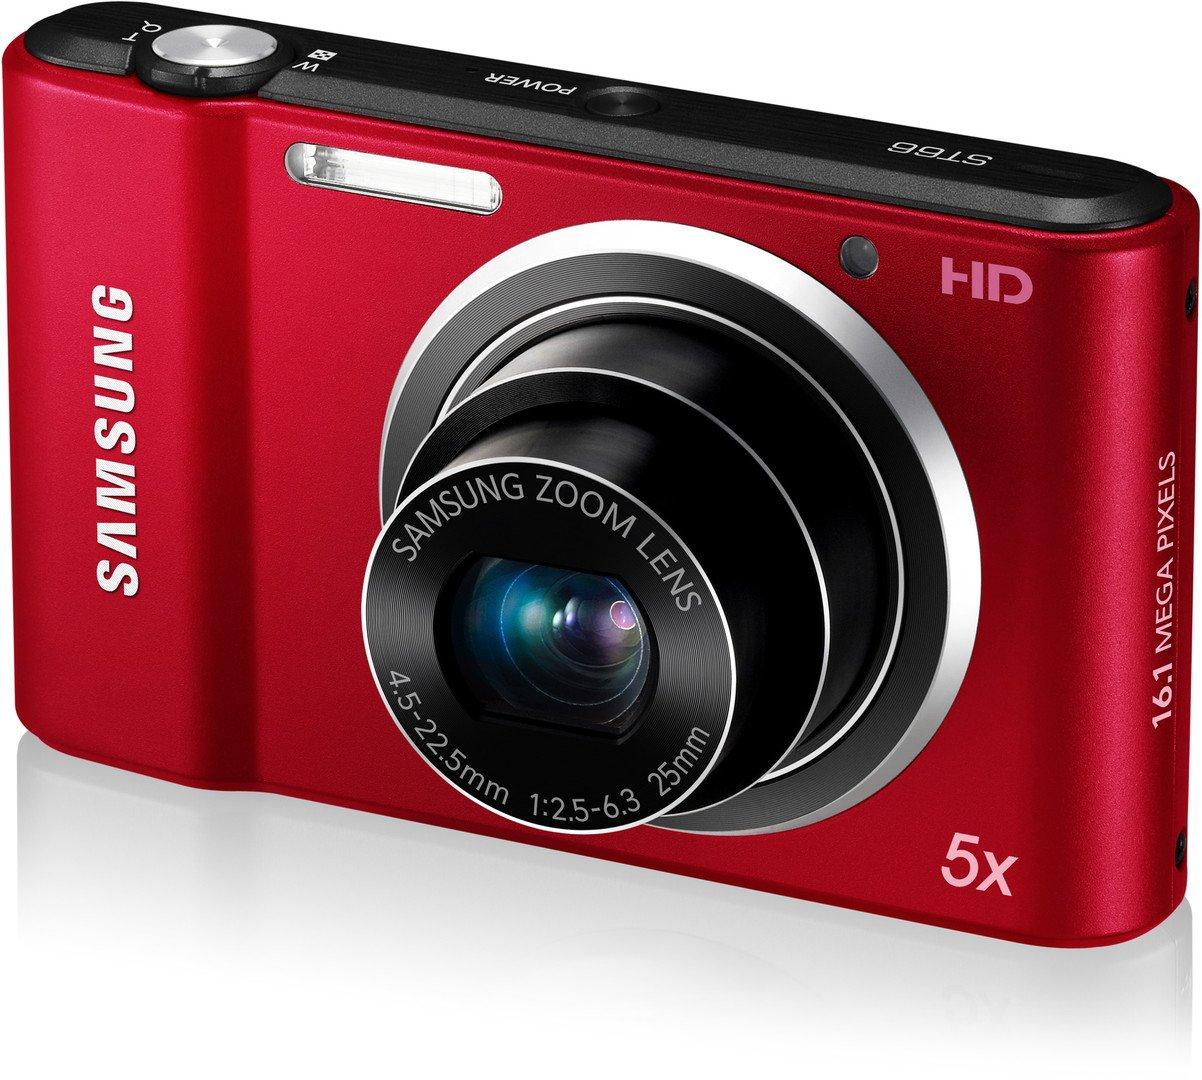 Amazon.com : Samsung ST66 16 MP Compact Digital Camera - Red (EC ...